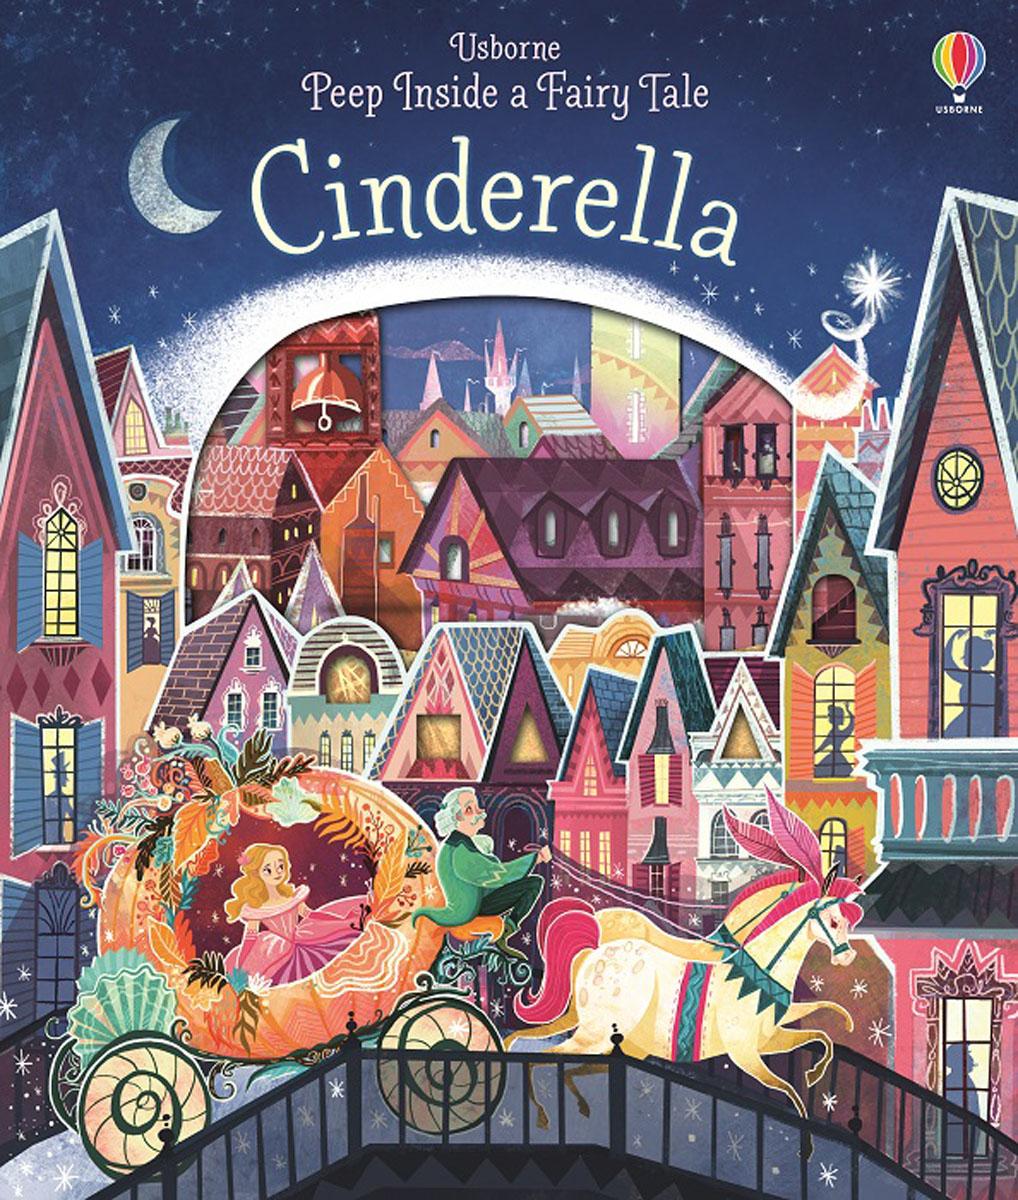 Peep Inside a Fairy Tale Cinderella a new lease of death